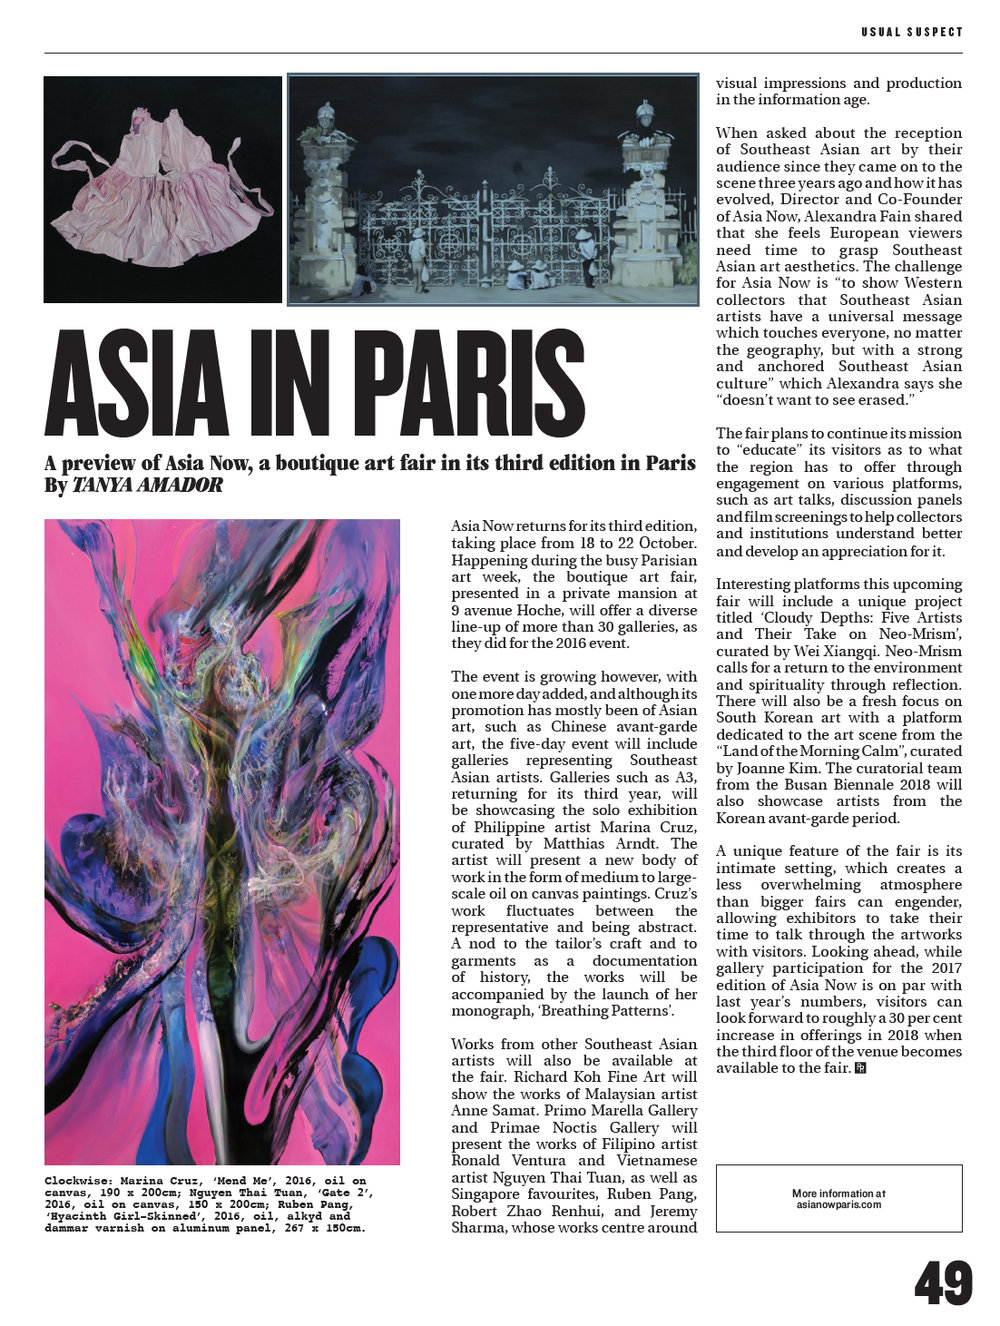 Asia-in-Paris-(Sep-2017).jpg